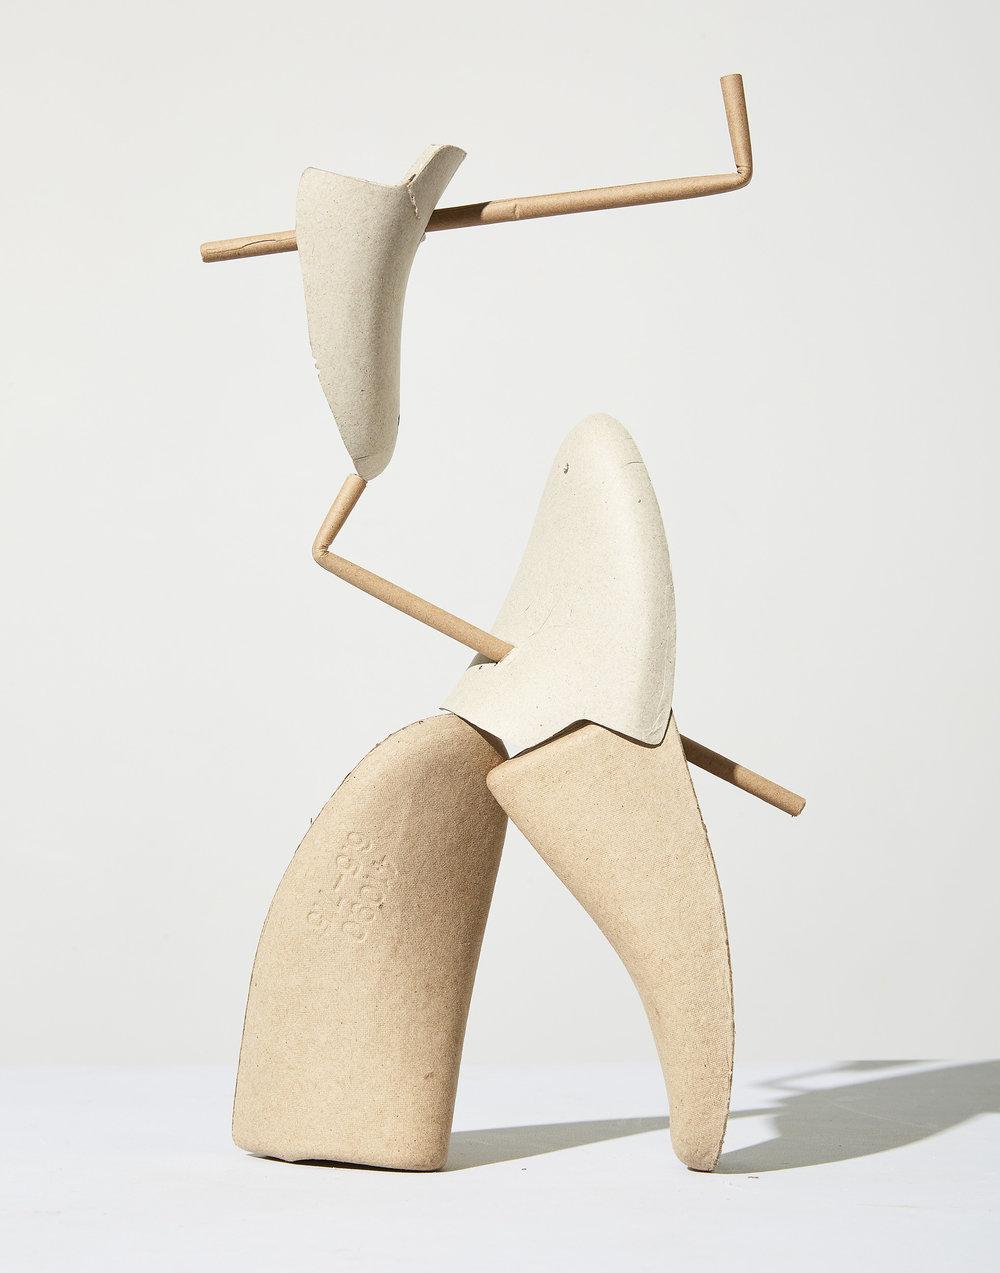 180316_SimpleConstructions_Shoes_Flat_Web.jpg